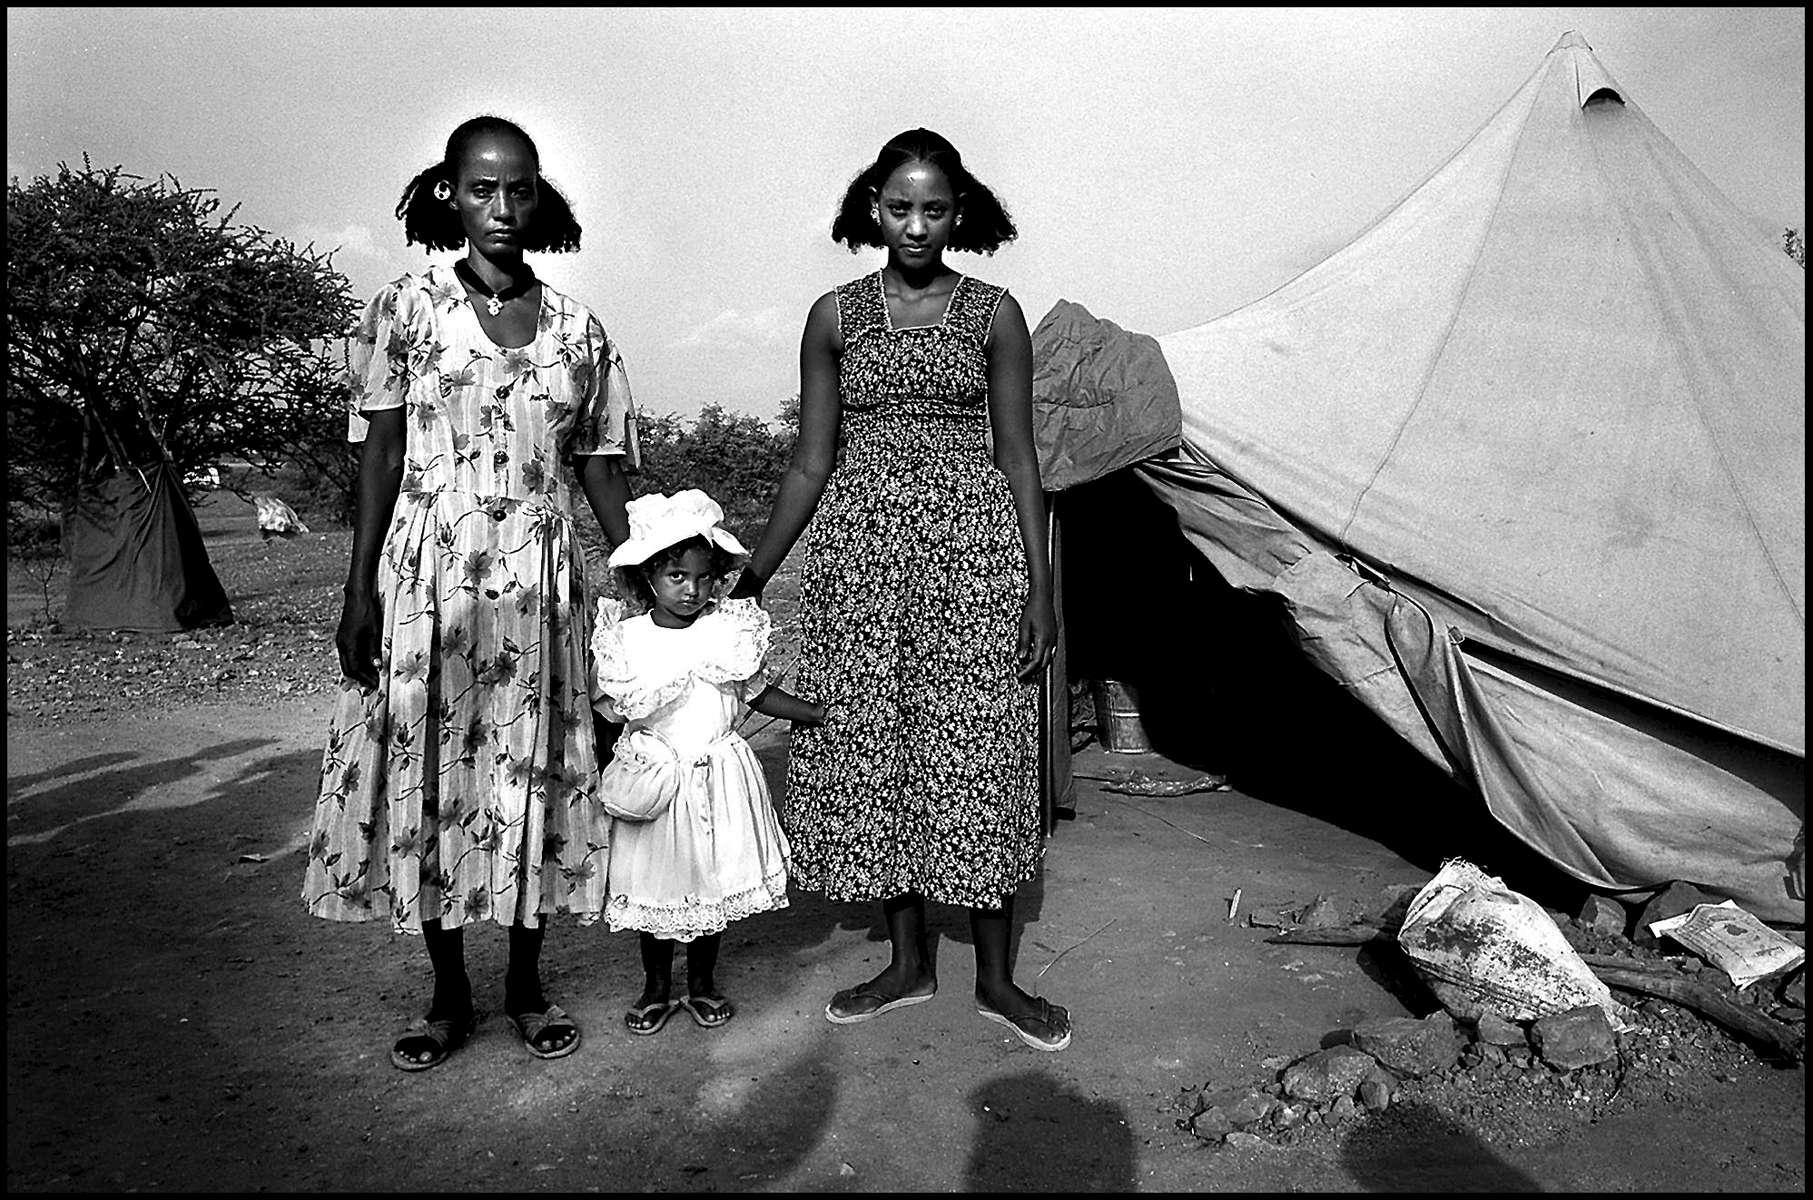 Refugee camp, Eritrea